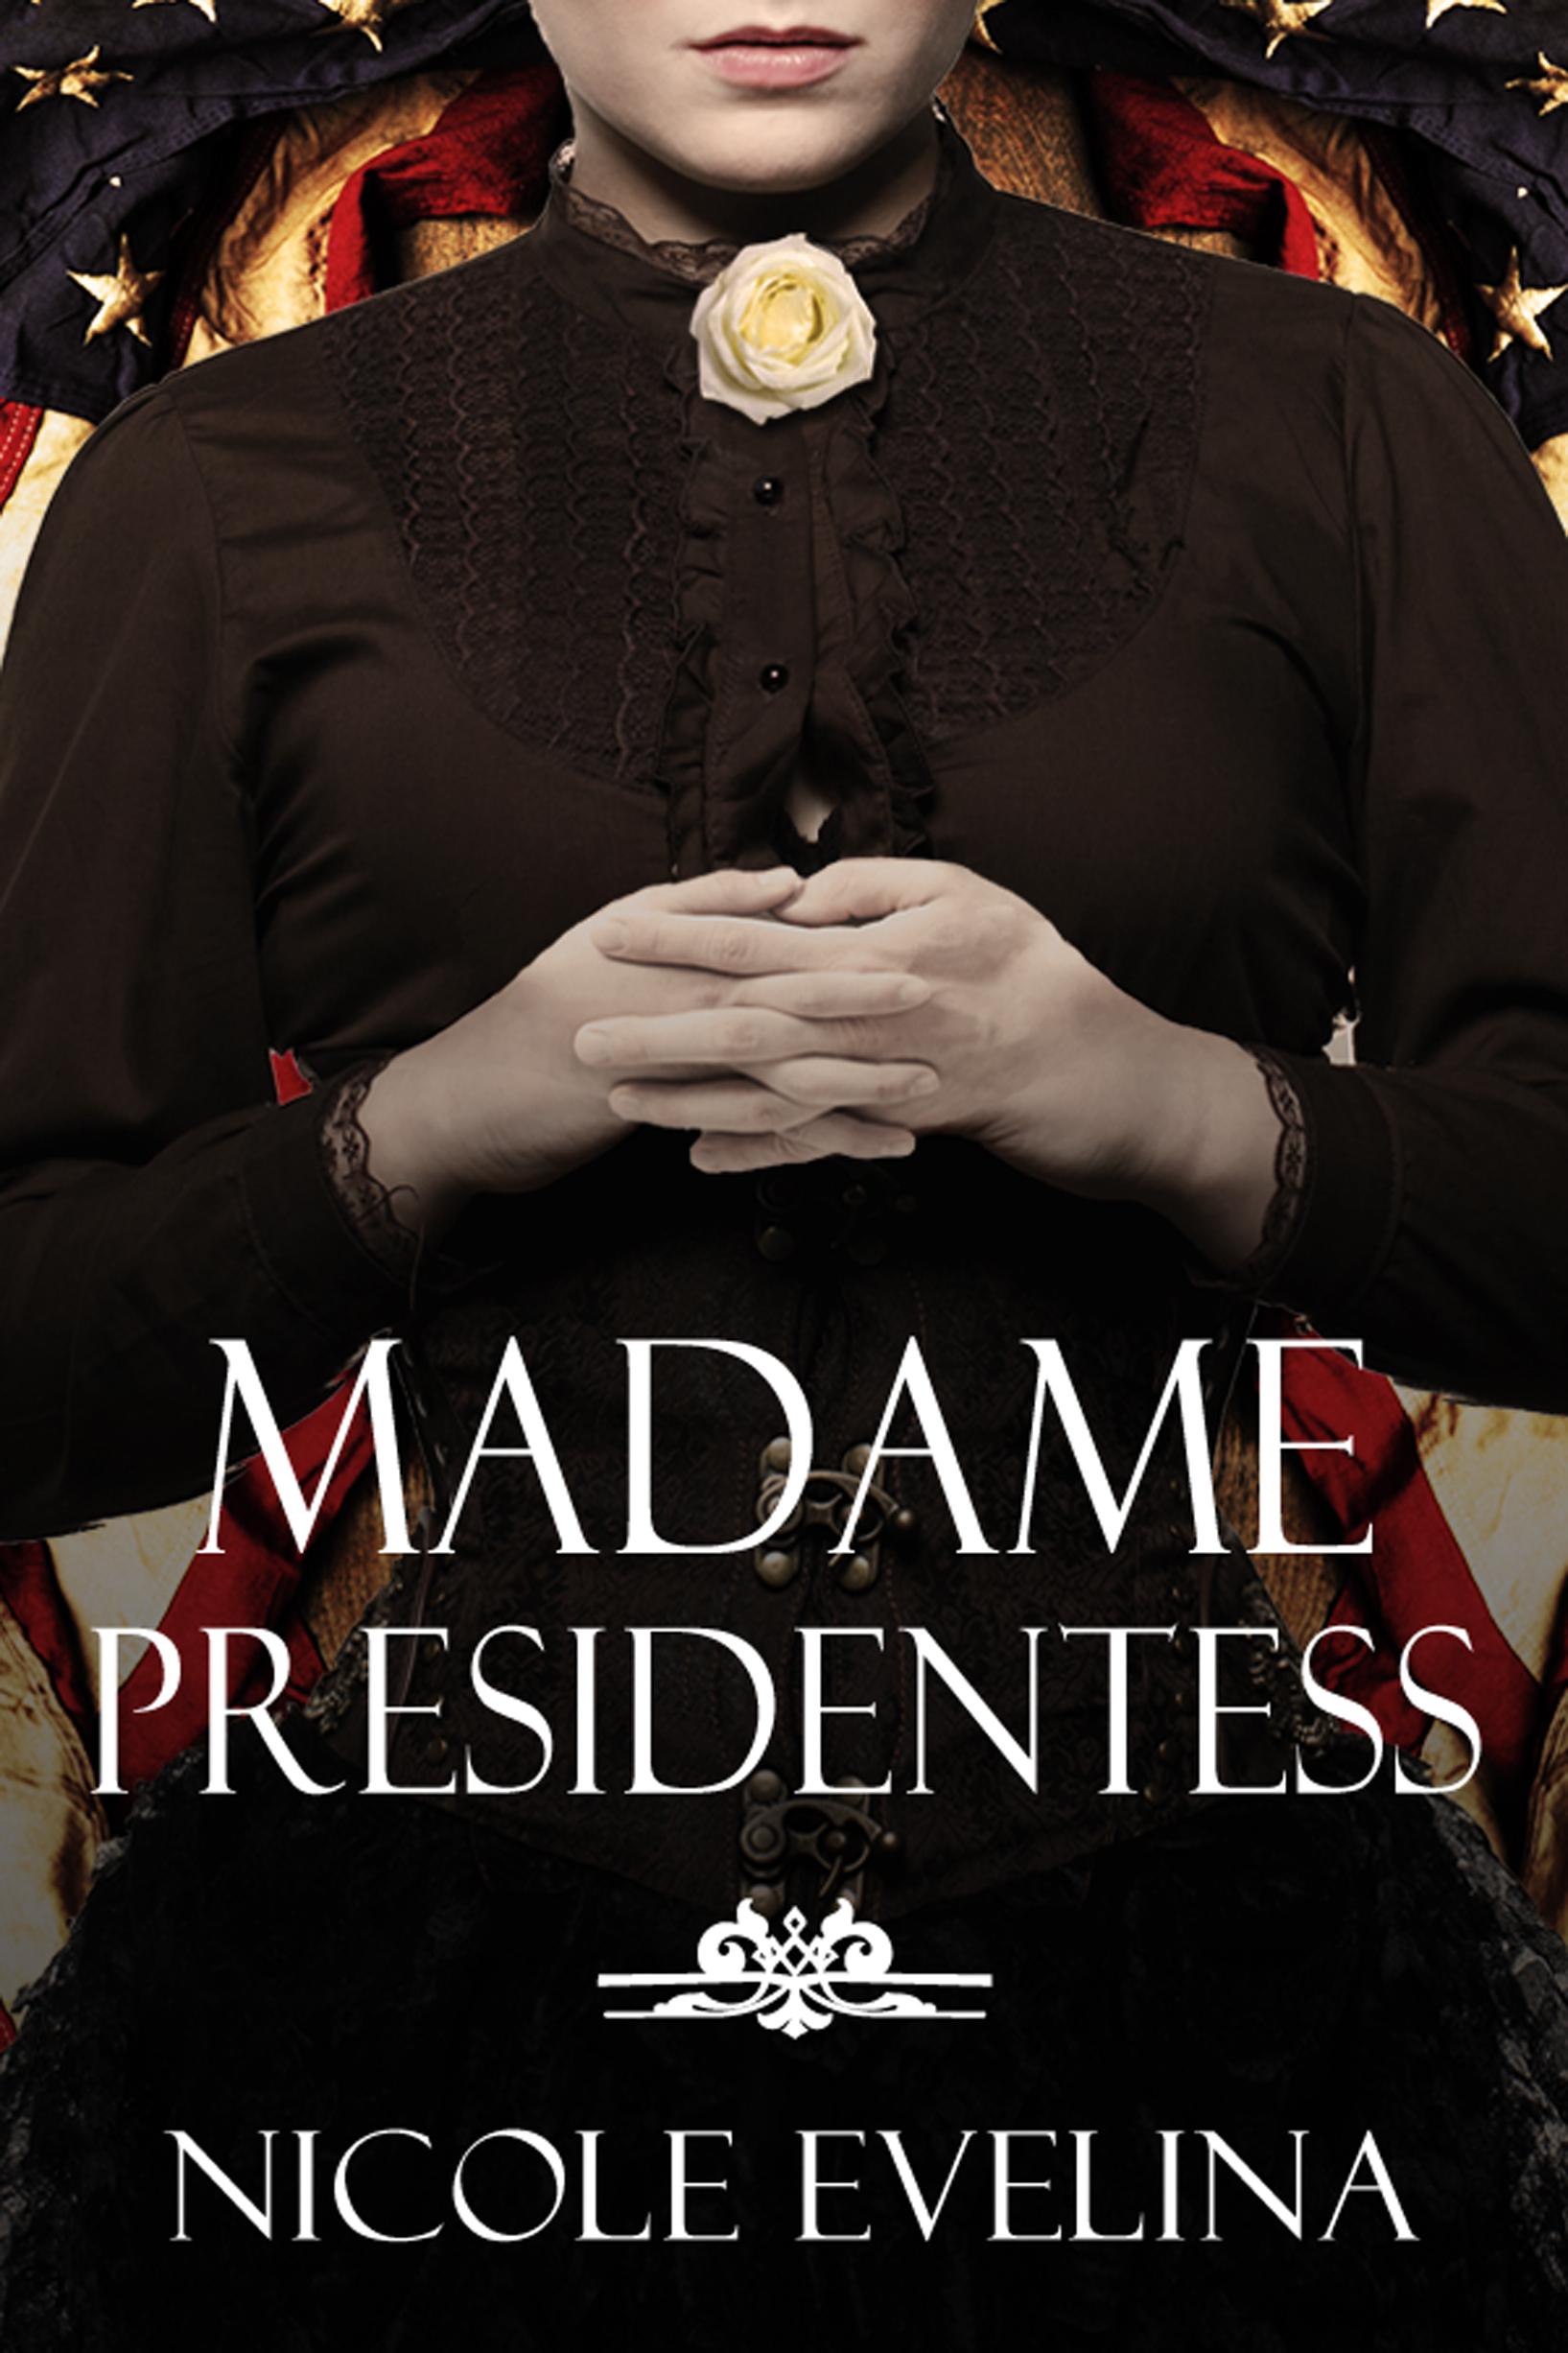 Madame Presidentess eBook Cover.jpeg